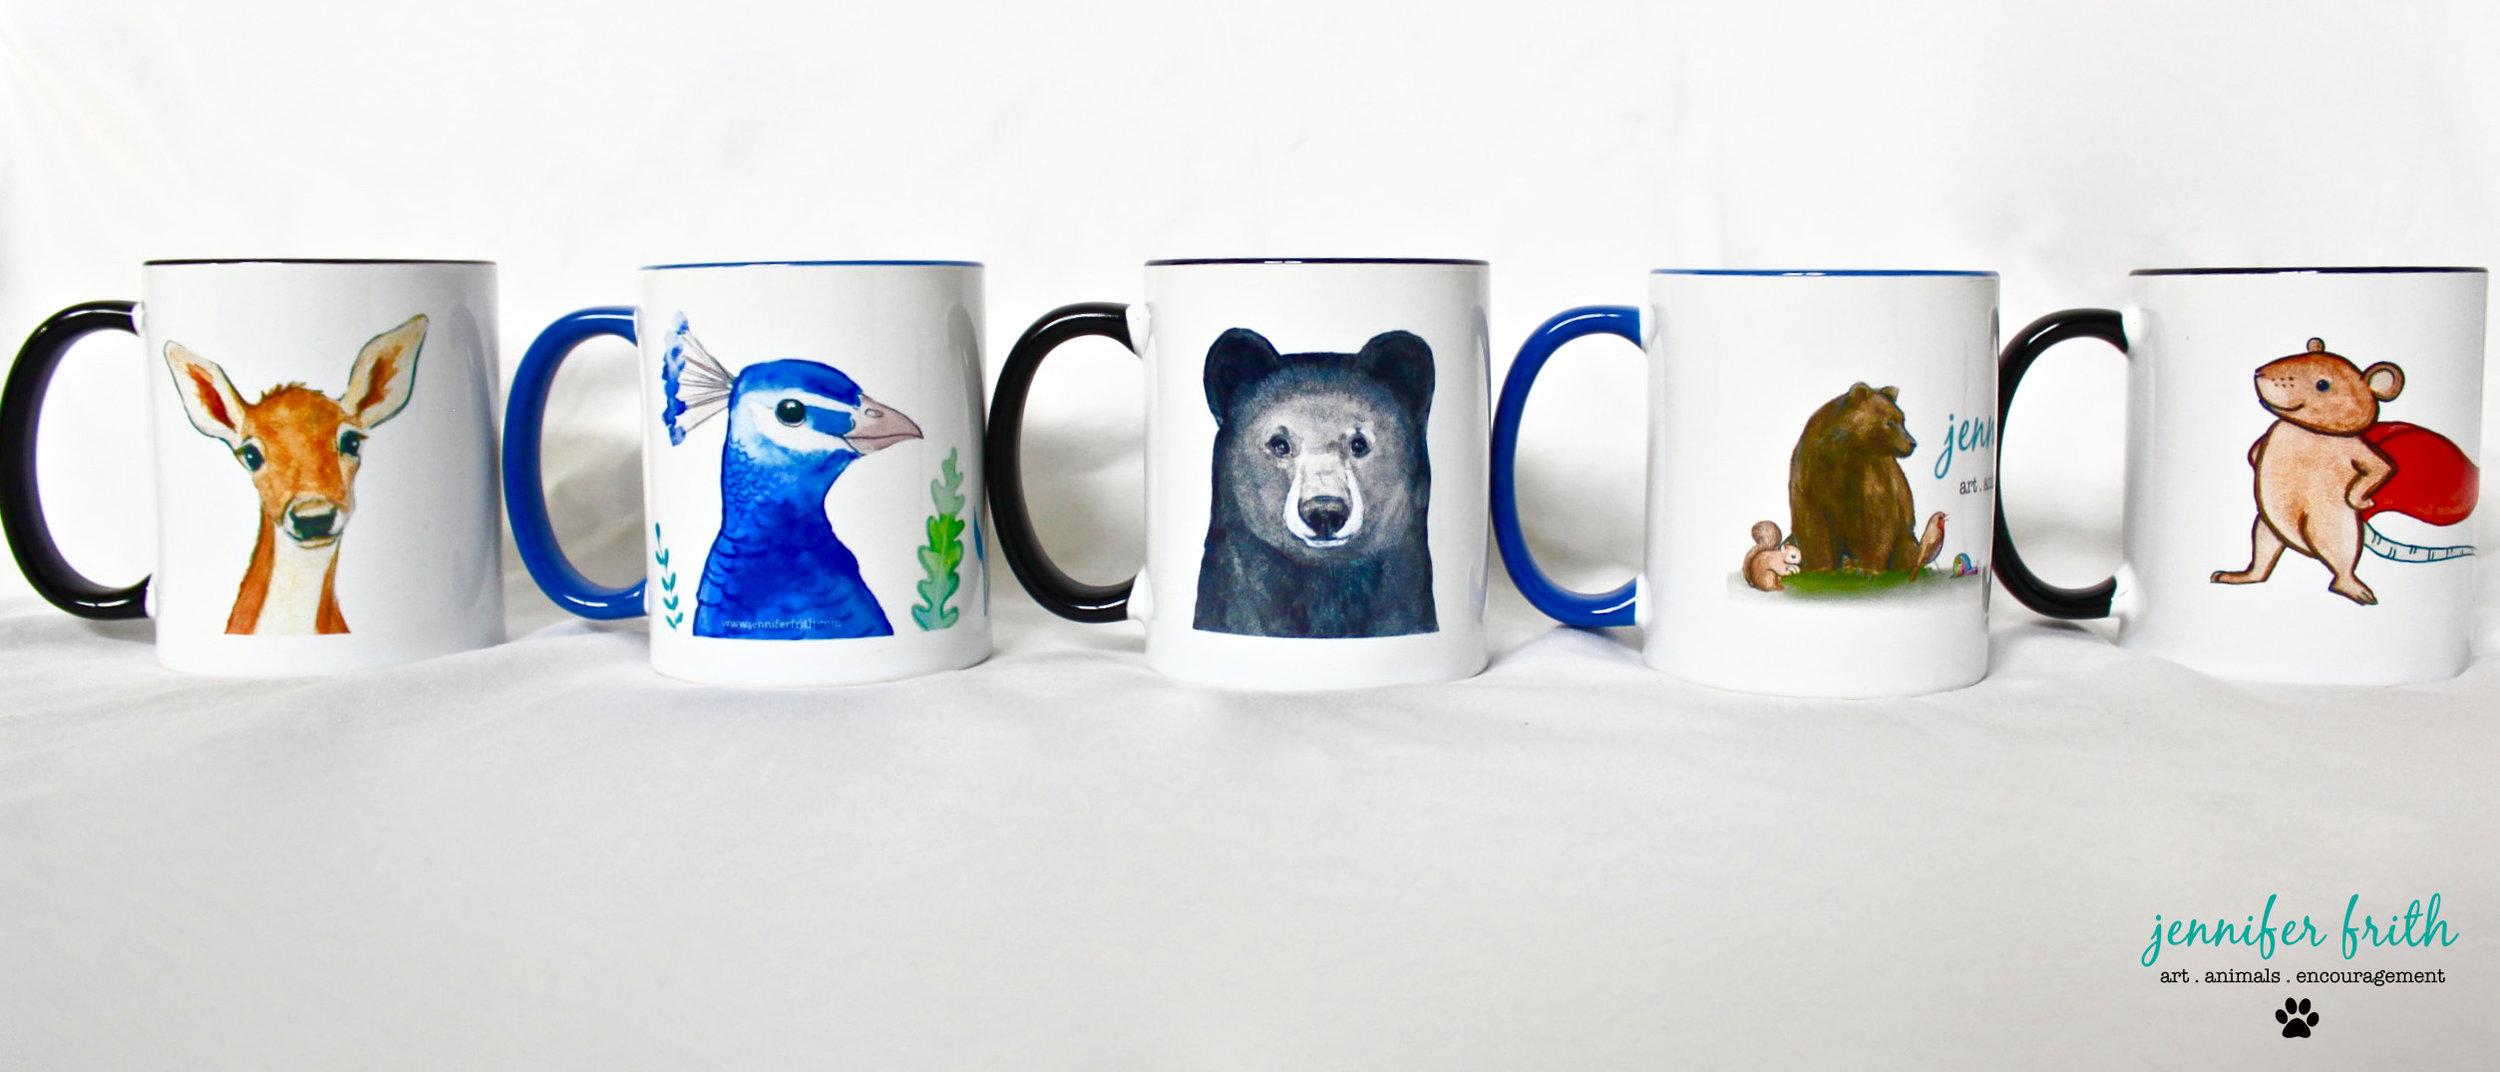 Jennifer_Frith_Illustrator_mugs